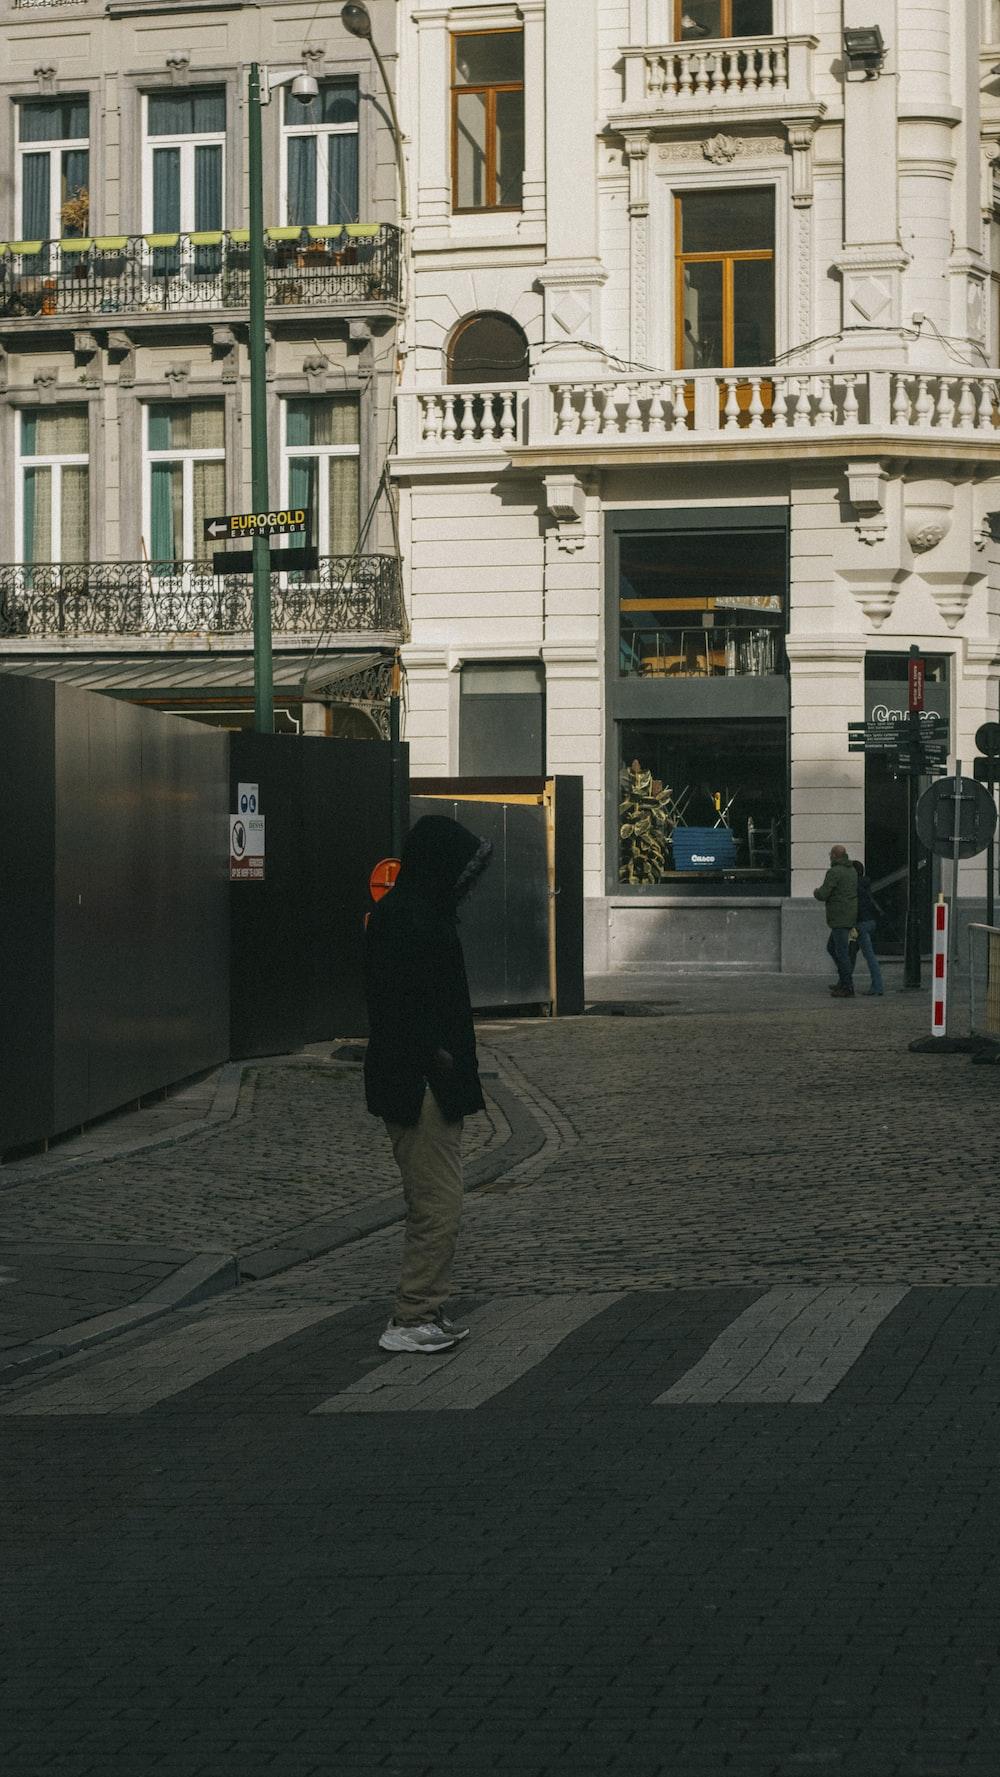 man in black jacket and gray pants walking on sidewalk during daytime